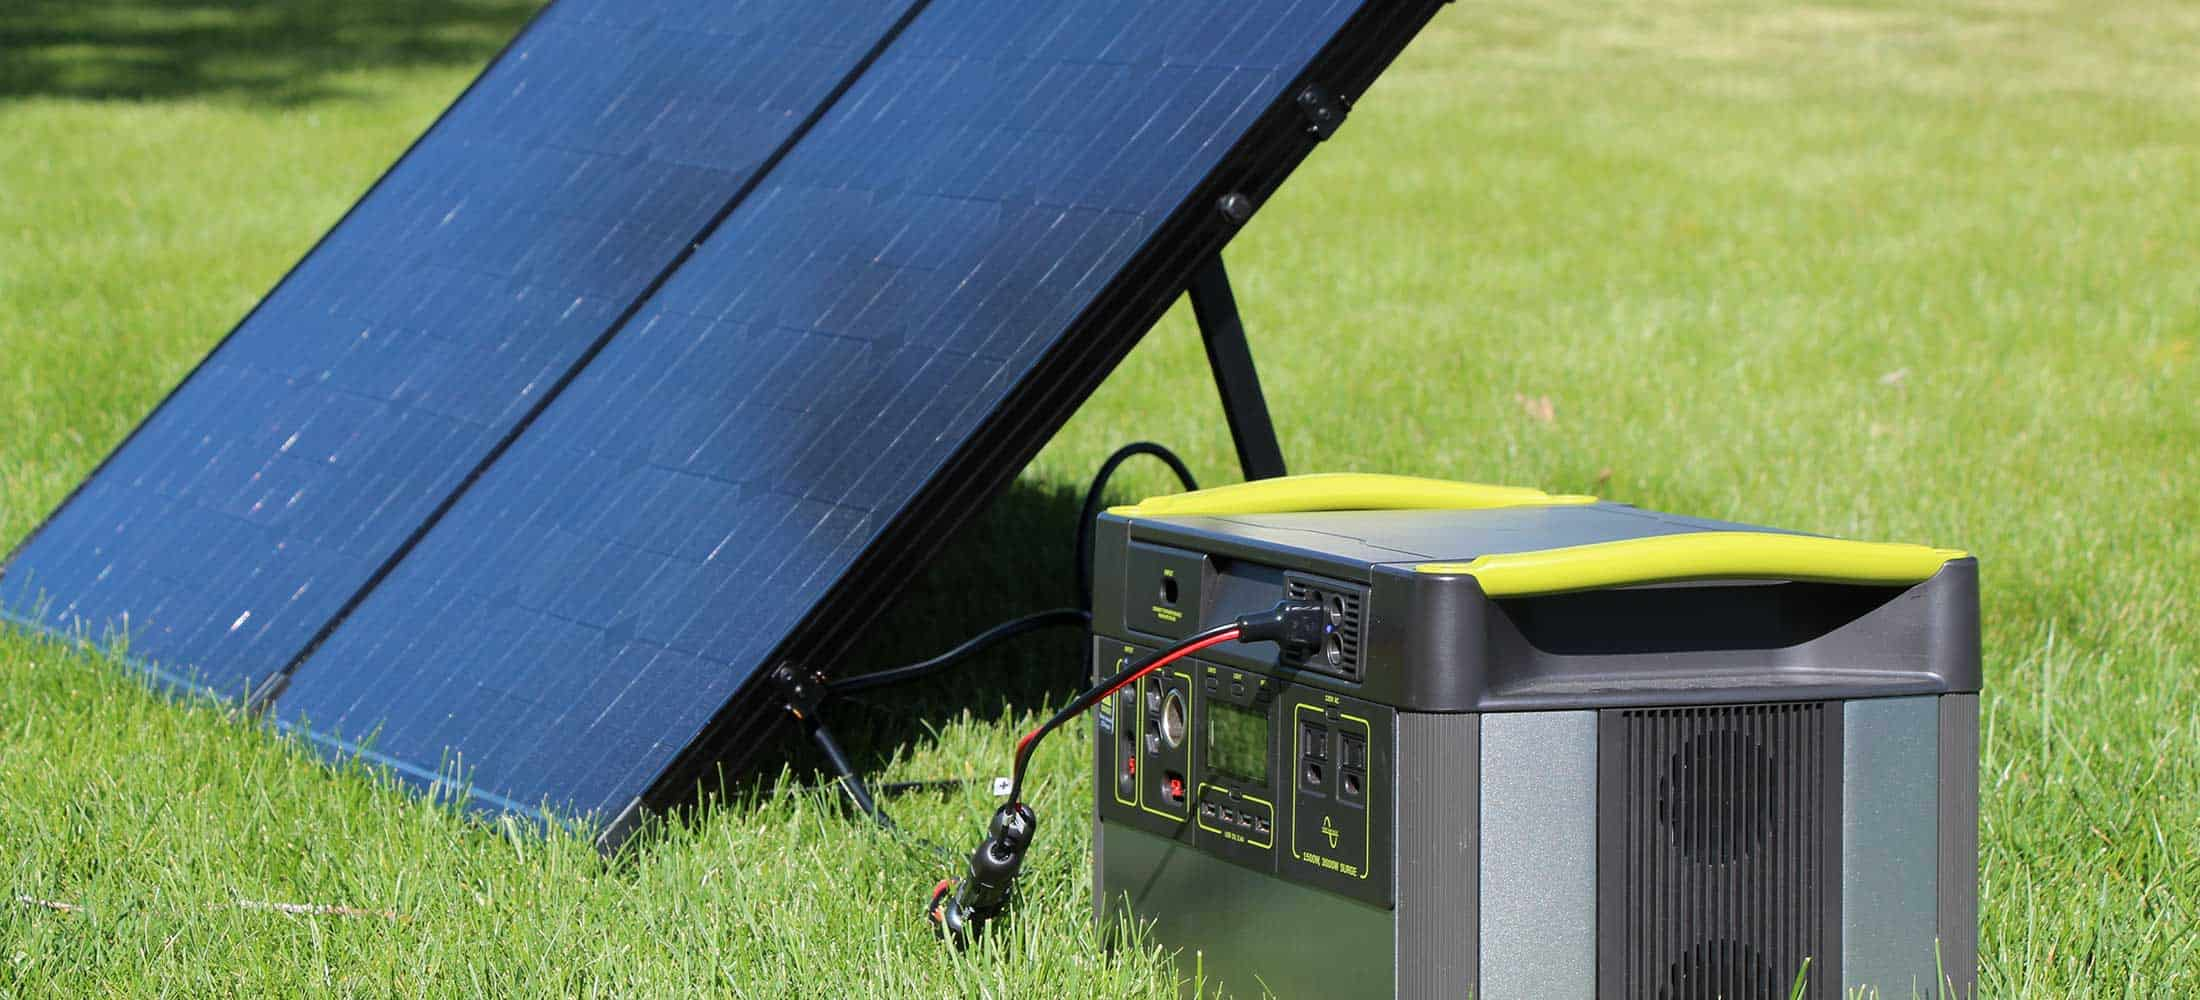 Goal Zero Yeti sitting in grass with a Renogy 100 watt solar panel